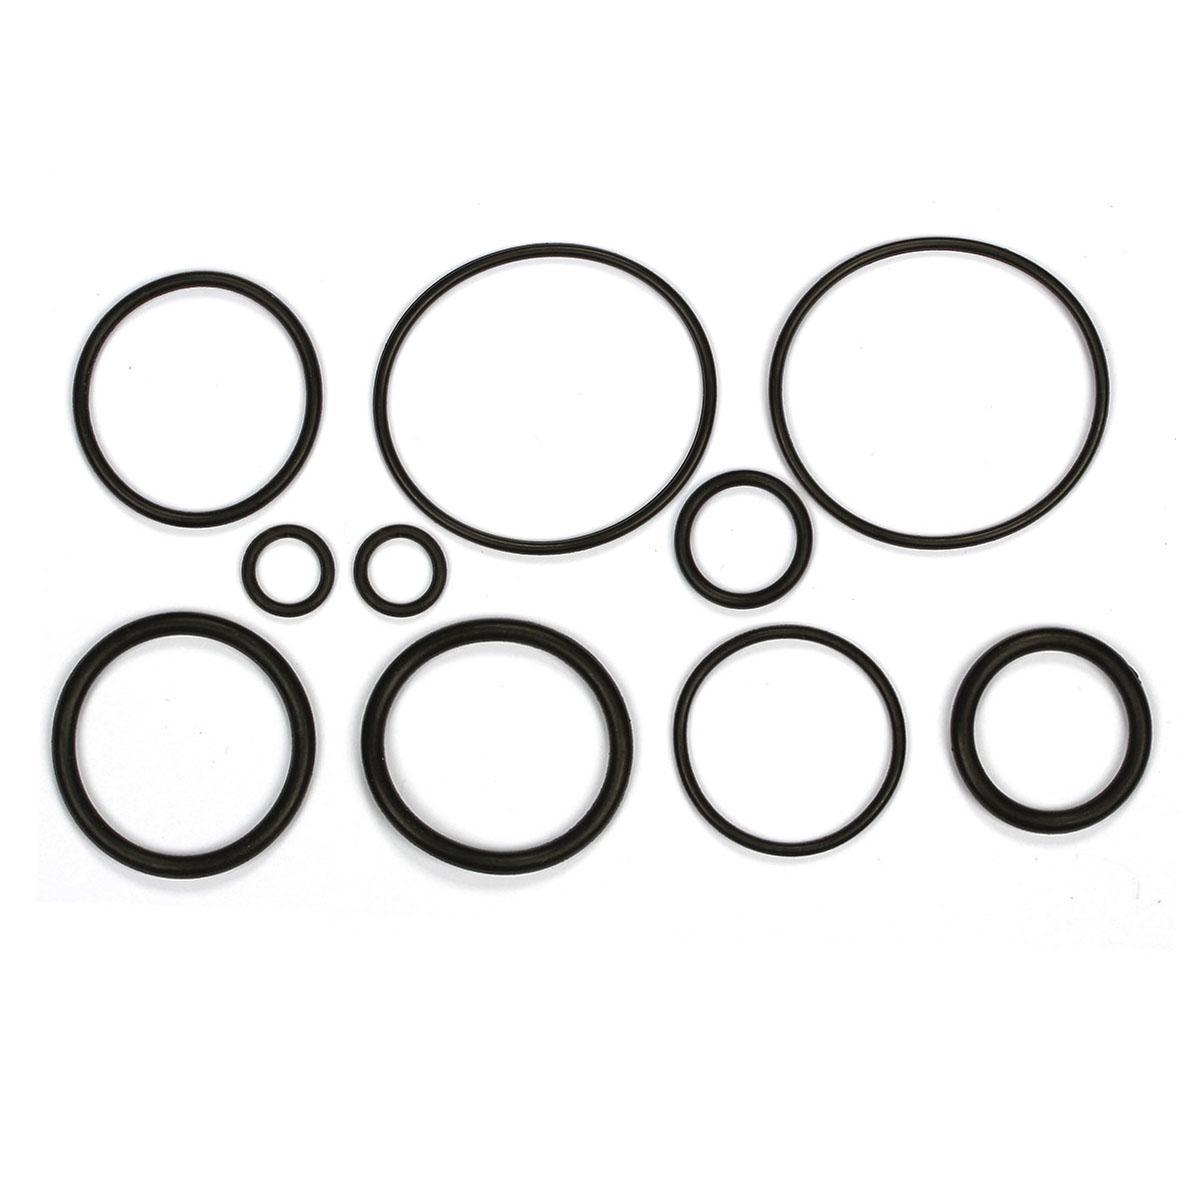 cylinder head gasket bolts kit fits 99